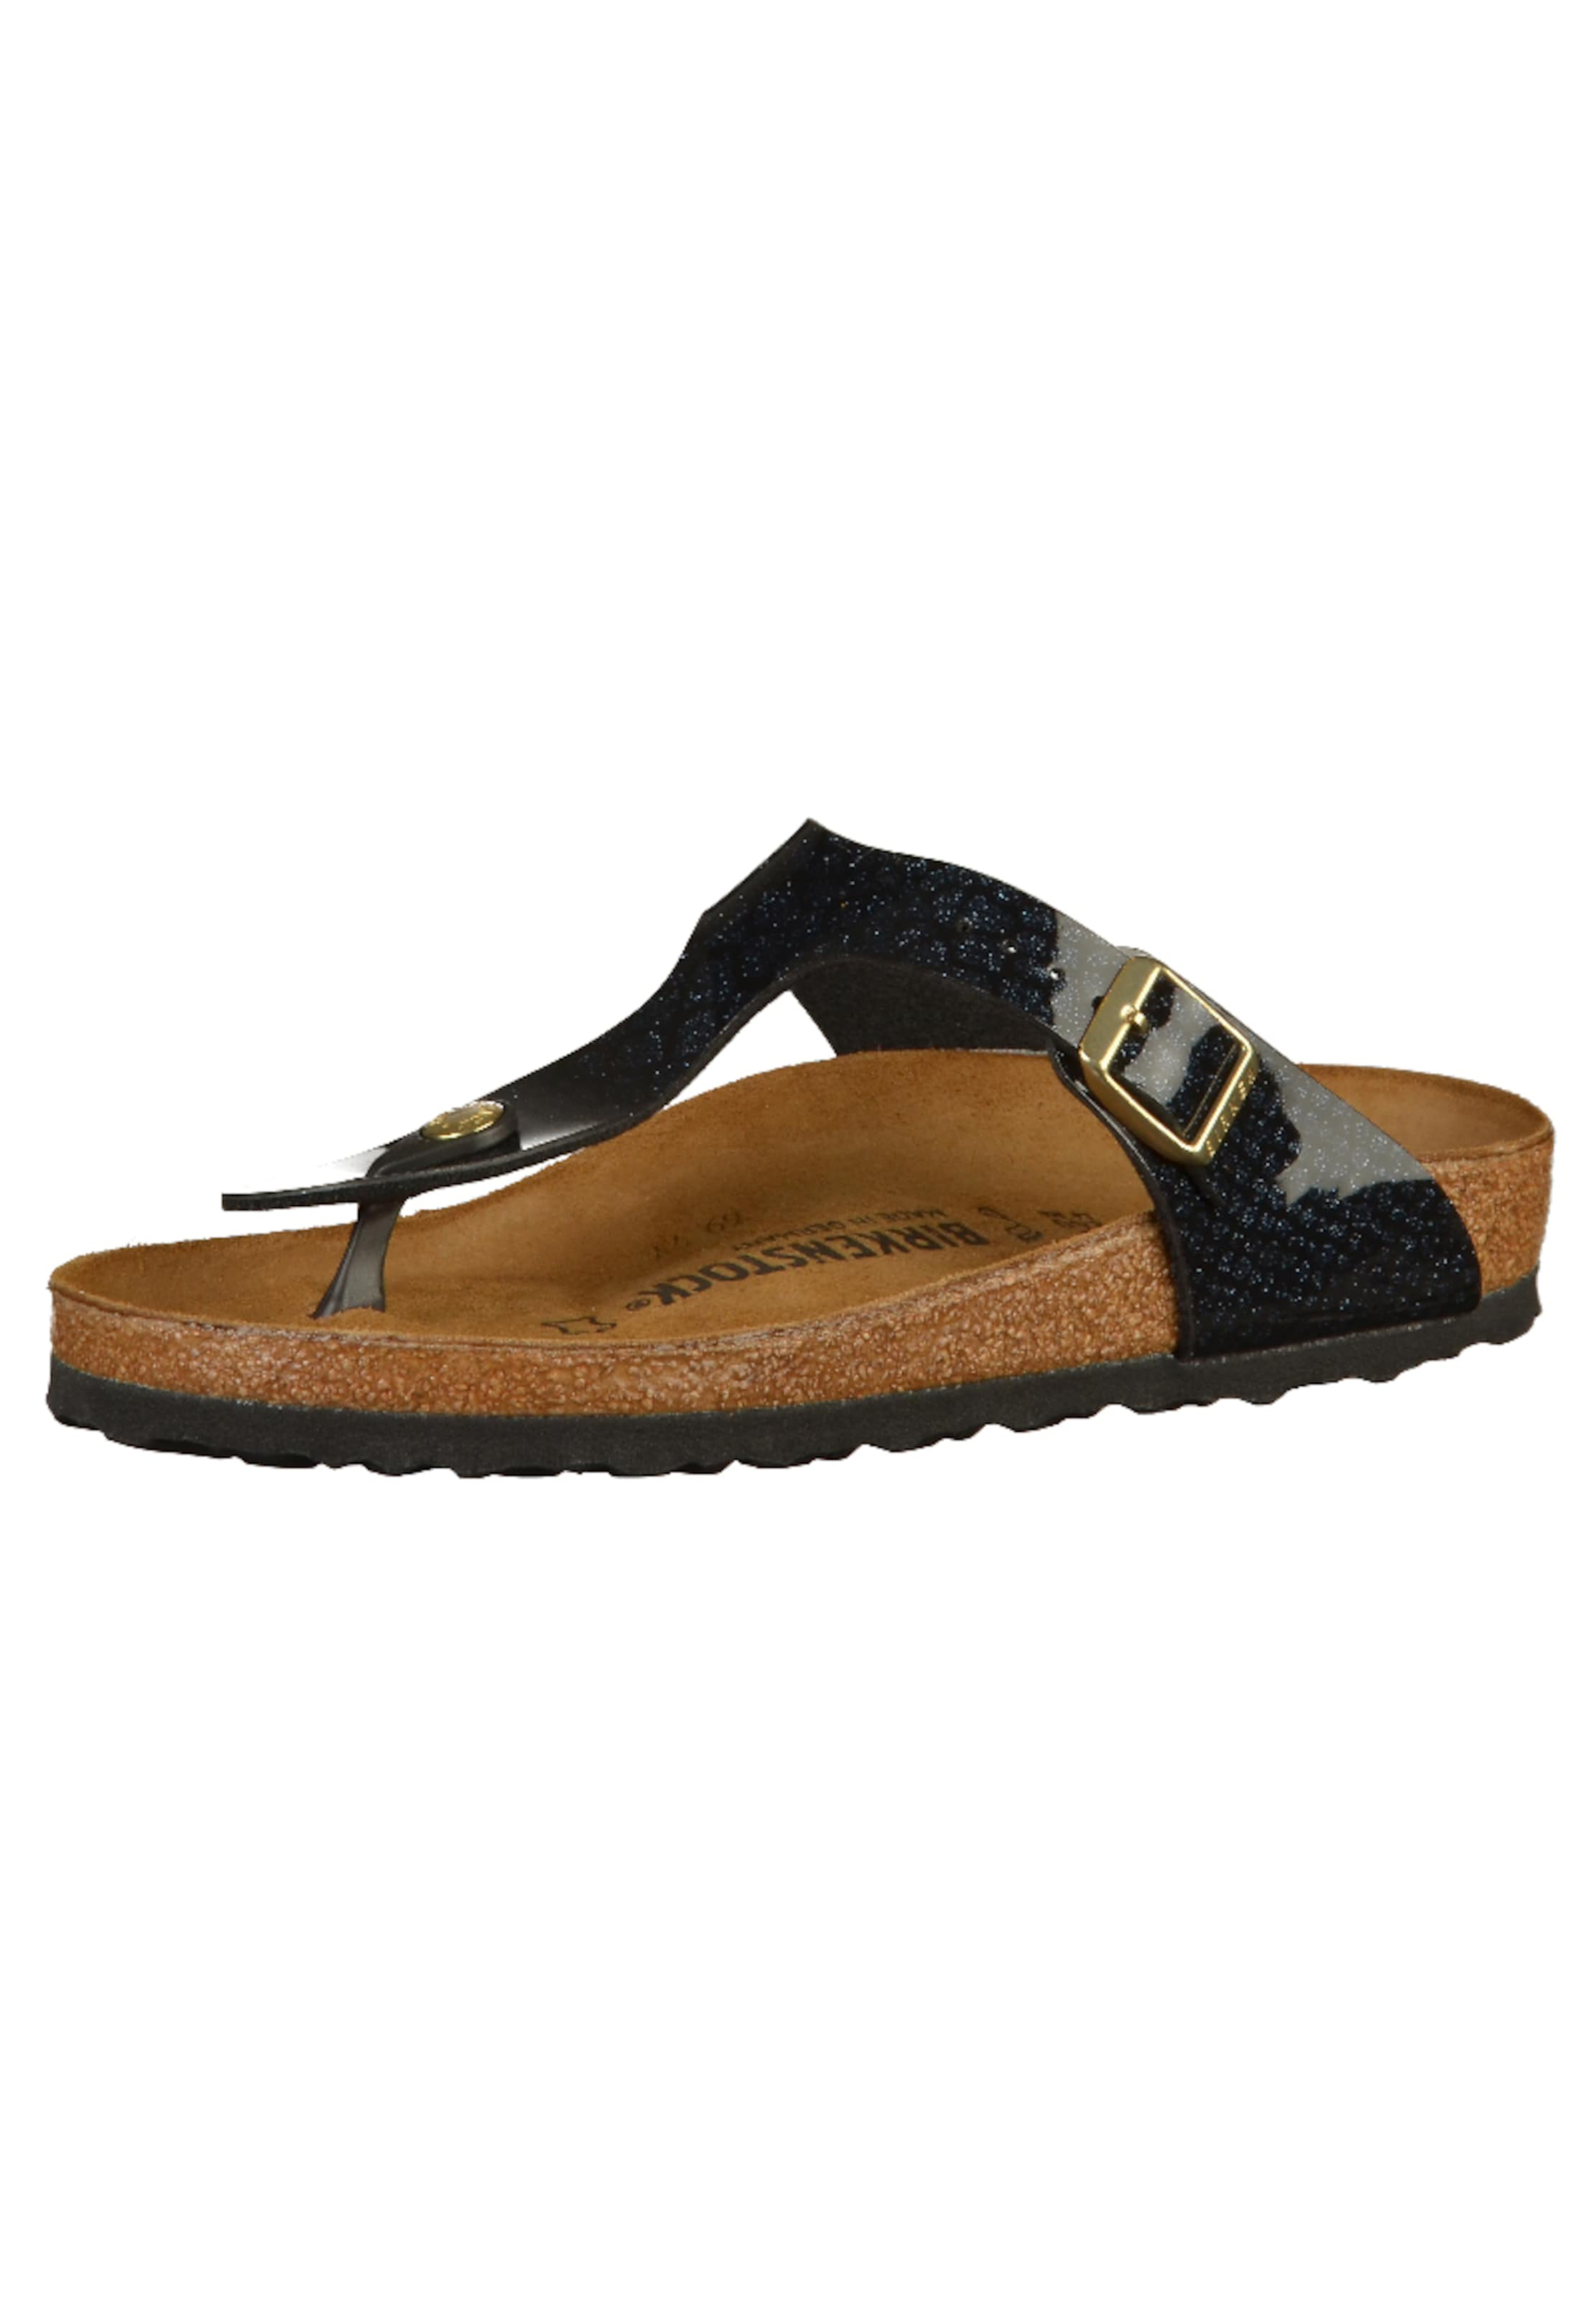 BIRKENSTOCK Zehensteg Gizeh Verschleißfeste billige Schuhe